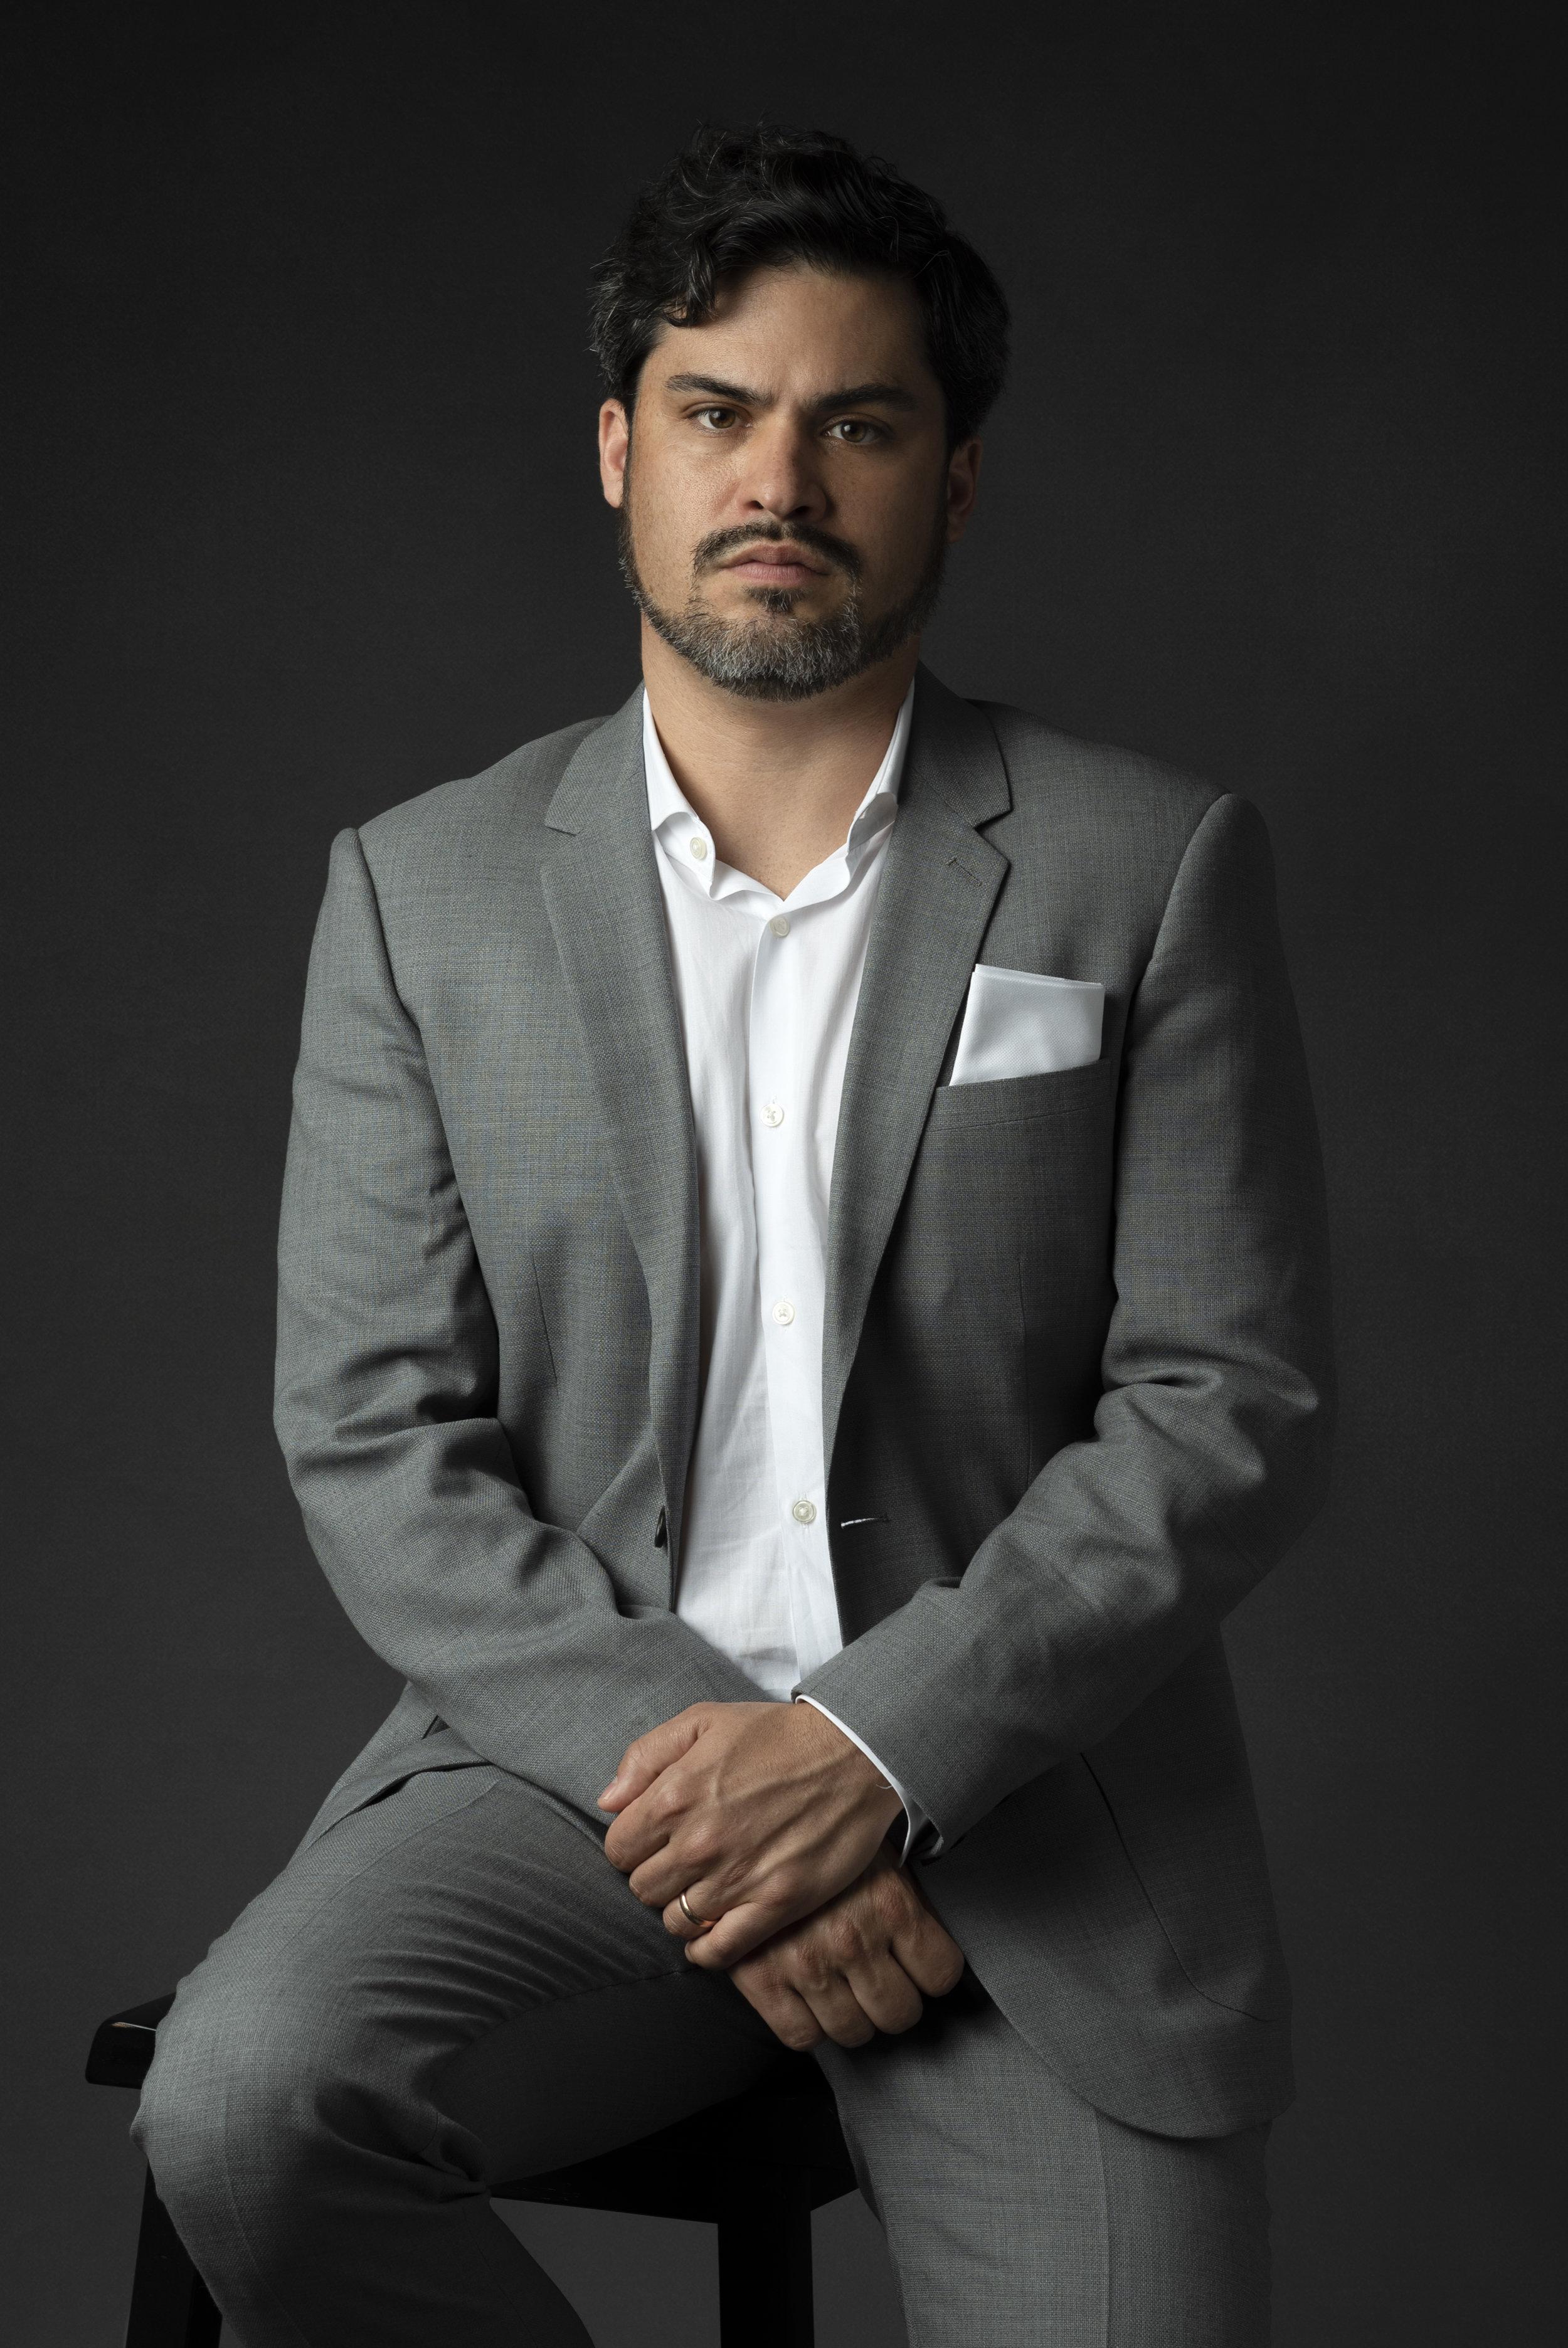 Studio portrait of man in gray suit on gray background